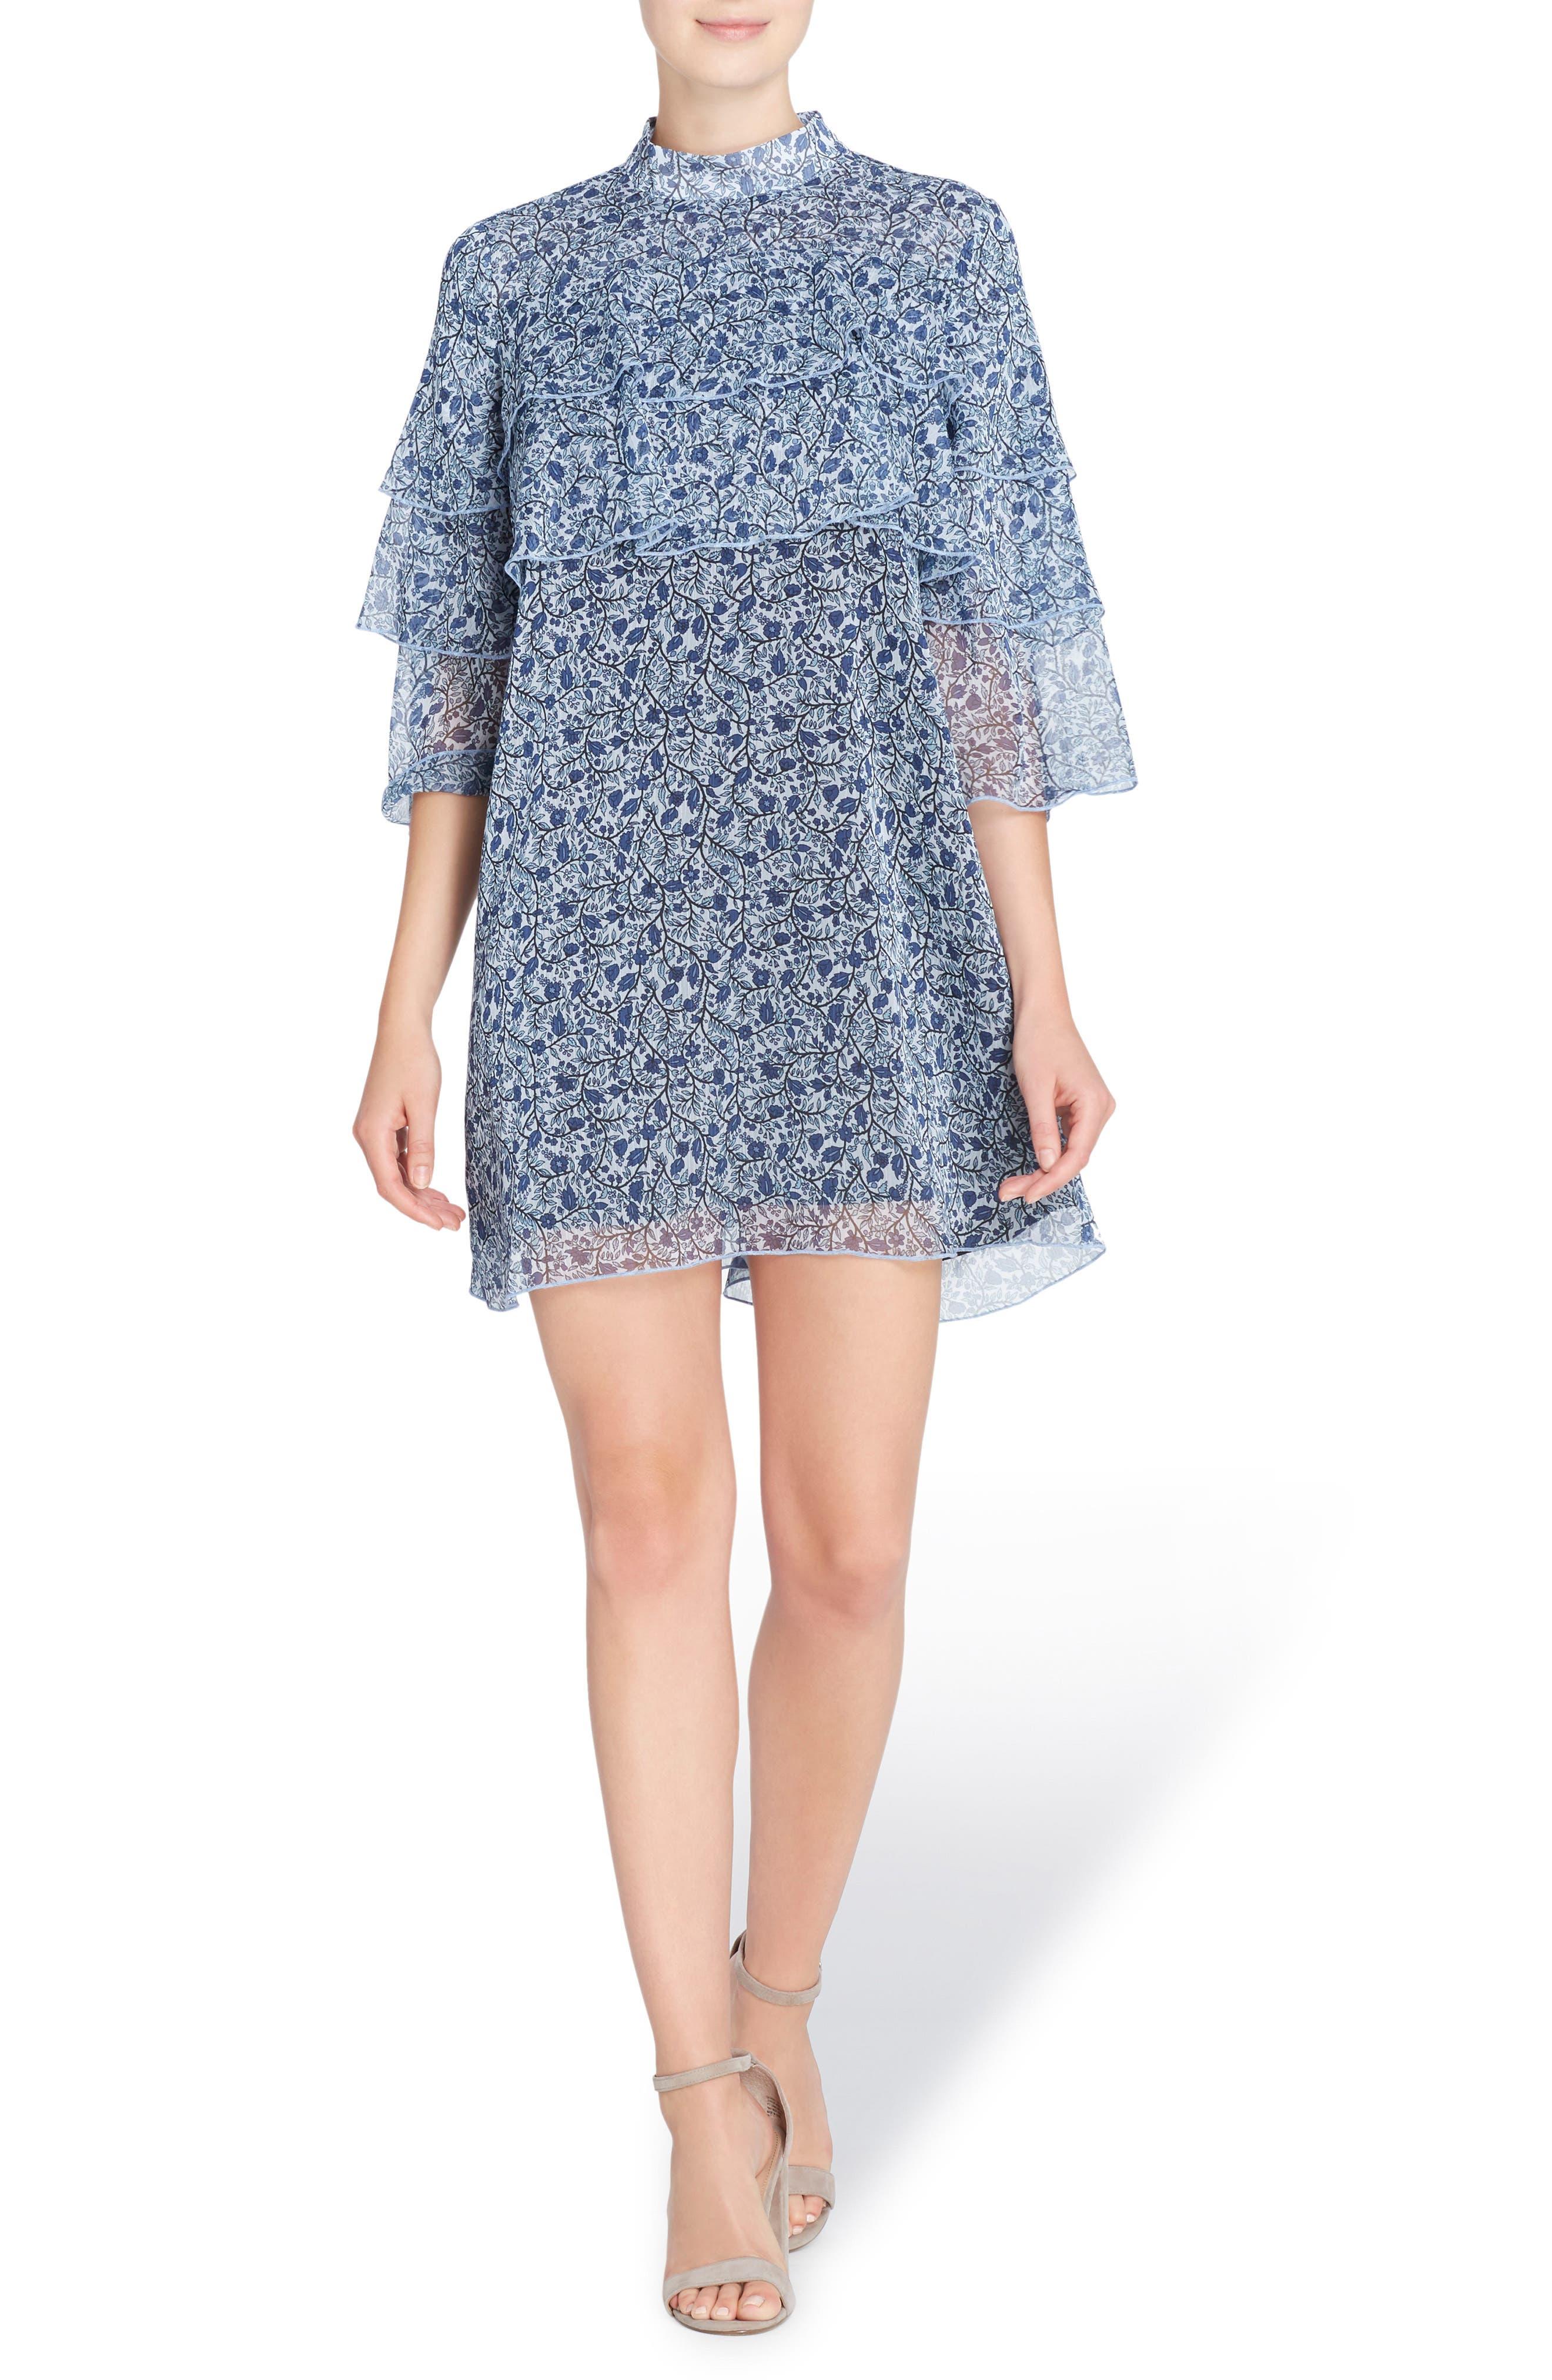 Alternate Image 1 Selected - Catherine Catherine Malandrino Cass Print Chiffon Dress